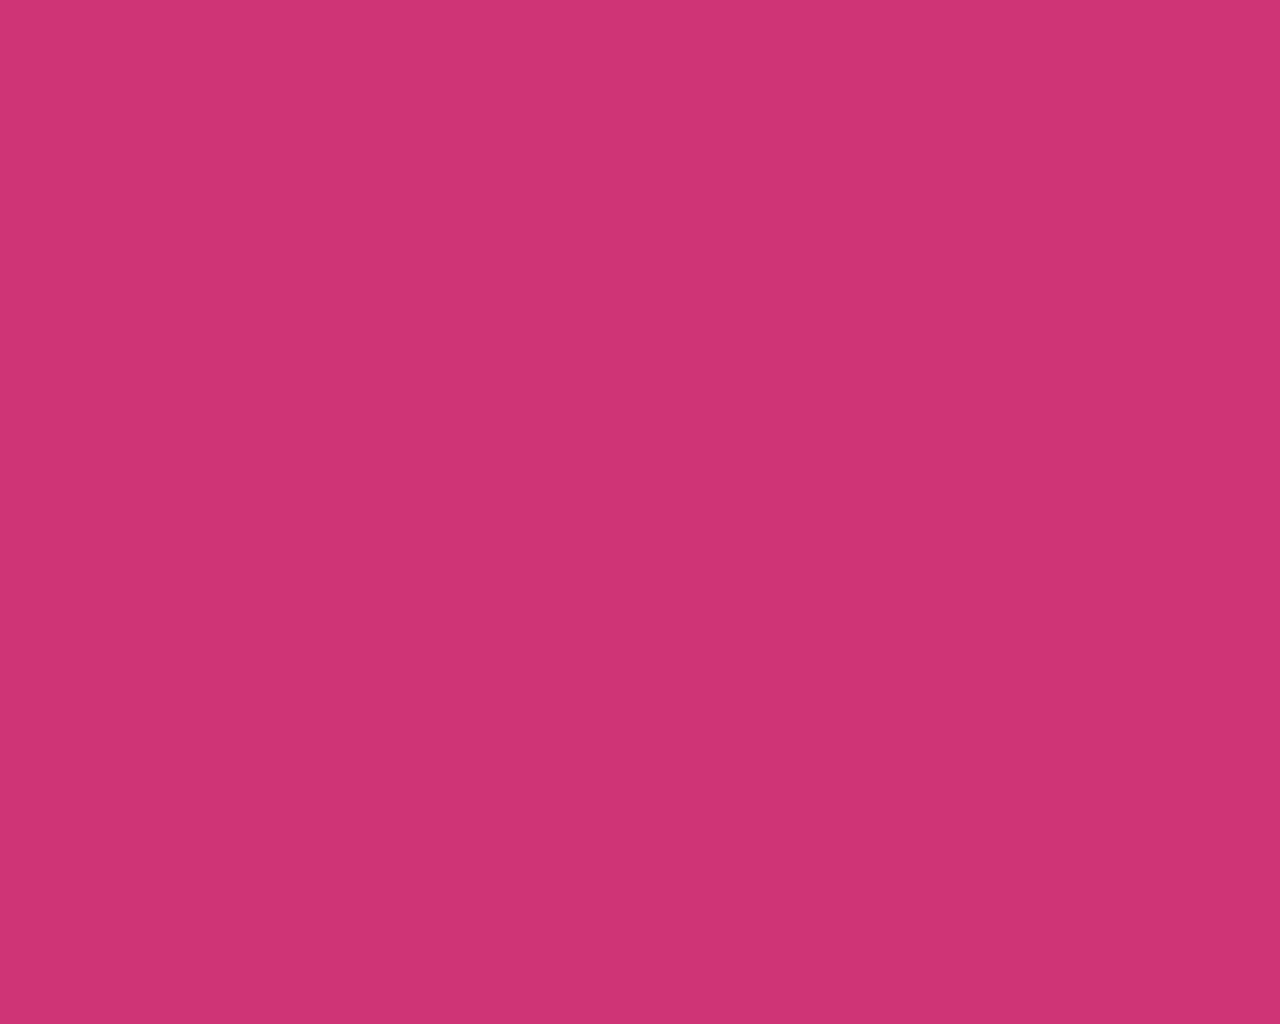 1280x1024 Telemagenta Solid Color Background